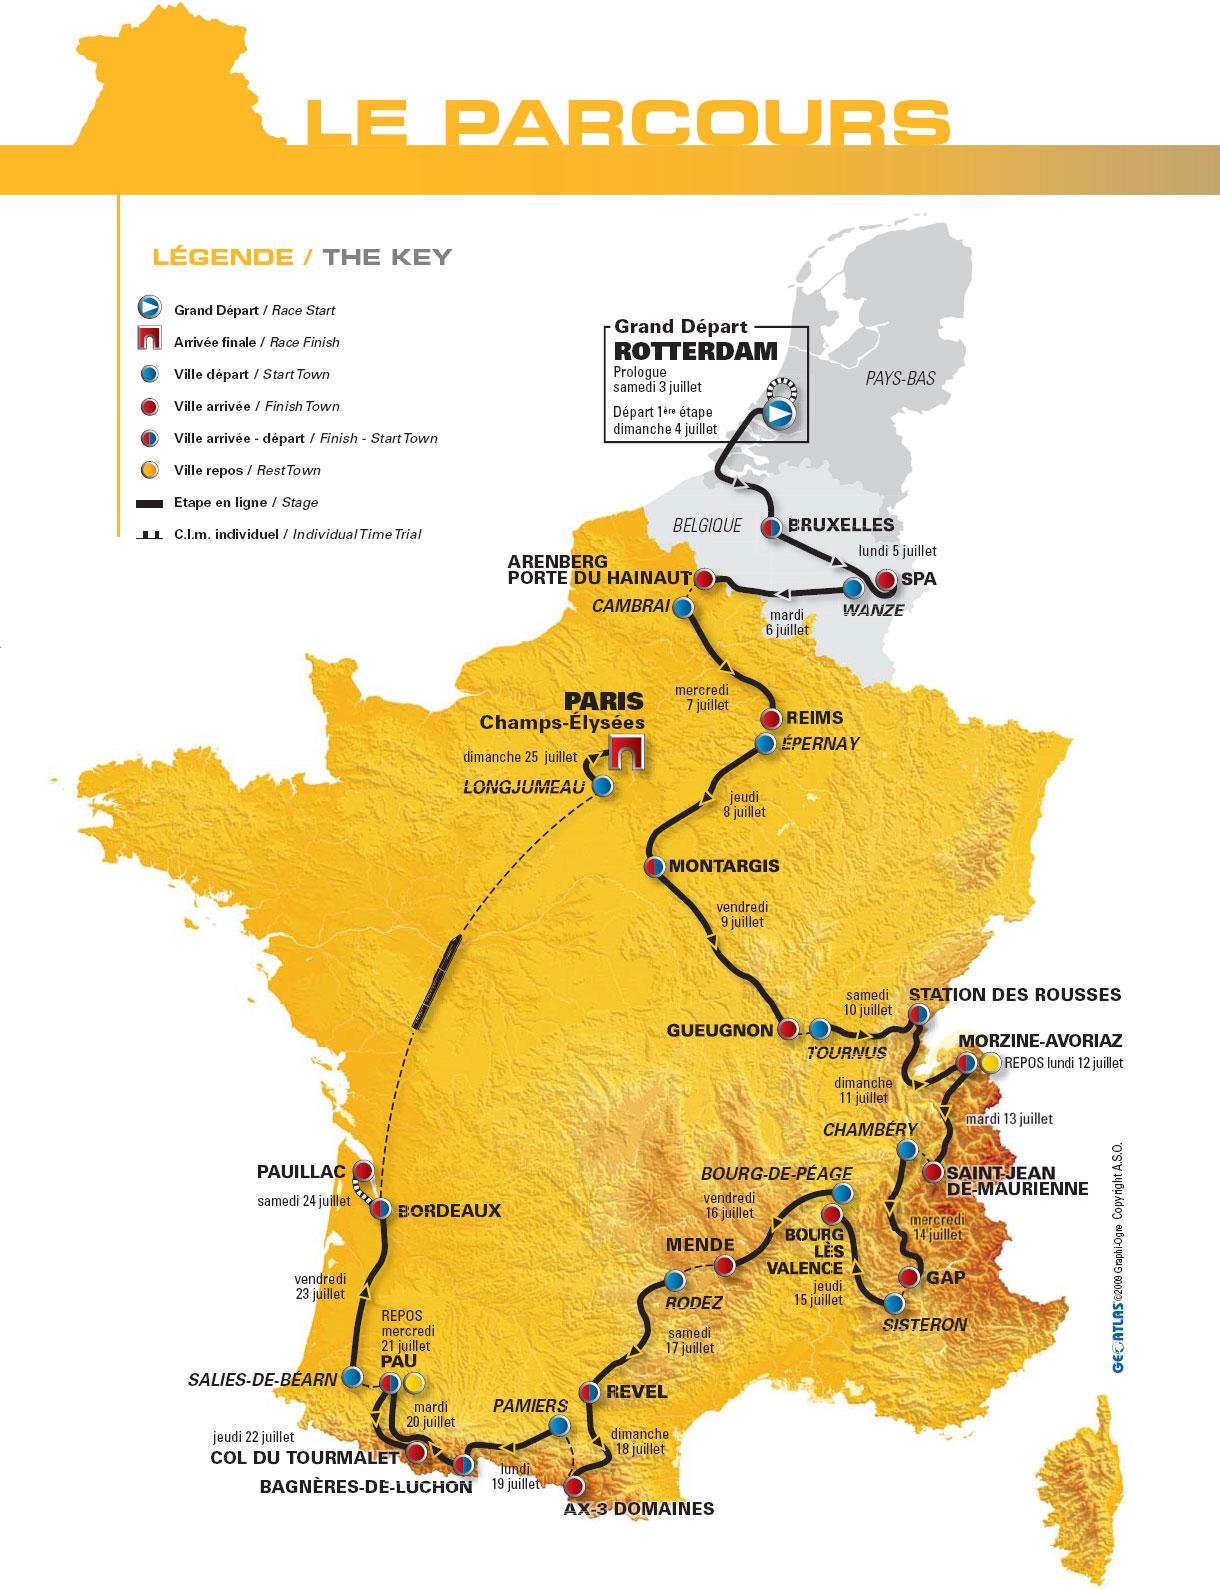 Tour de France 2010: the route and the stages :: Blog :: velowire.com (paris.thover.com ...